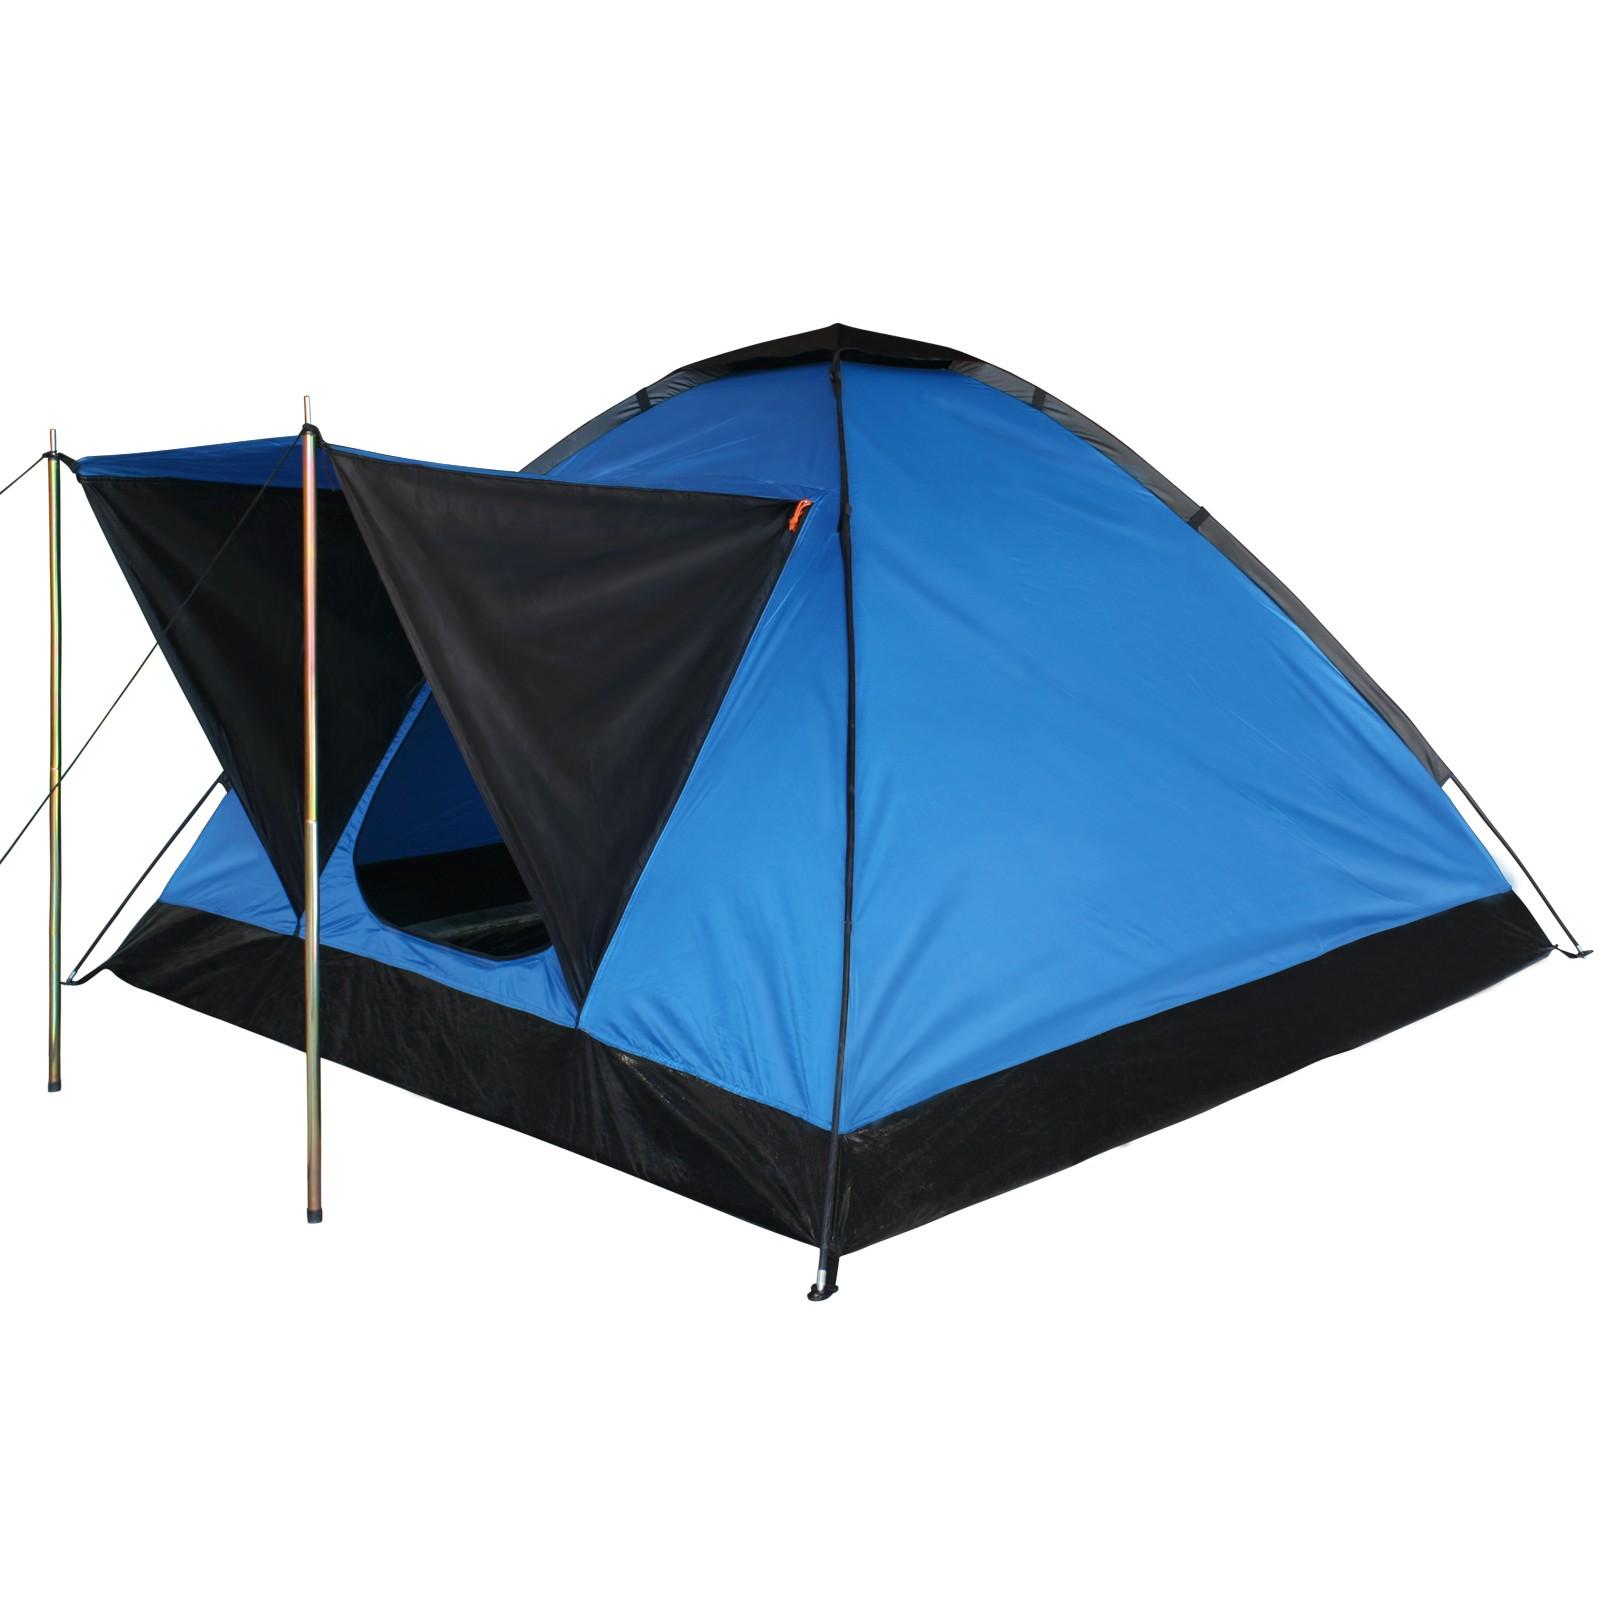 zelt kuppelzelt campingzelt festivalzelt ocean f r 2 3. Black Bedroom Furniture Sets. Home Design Ideas